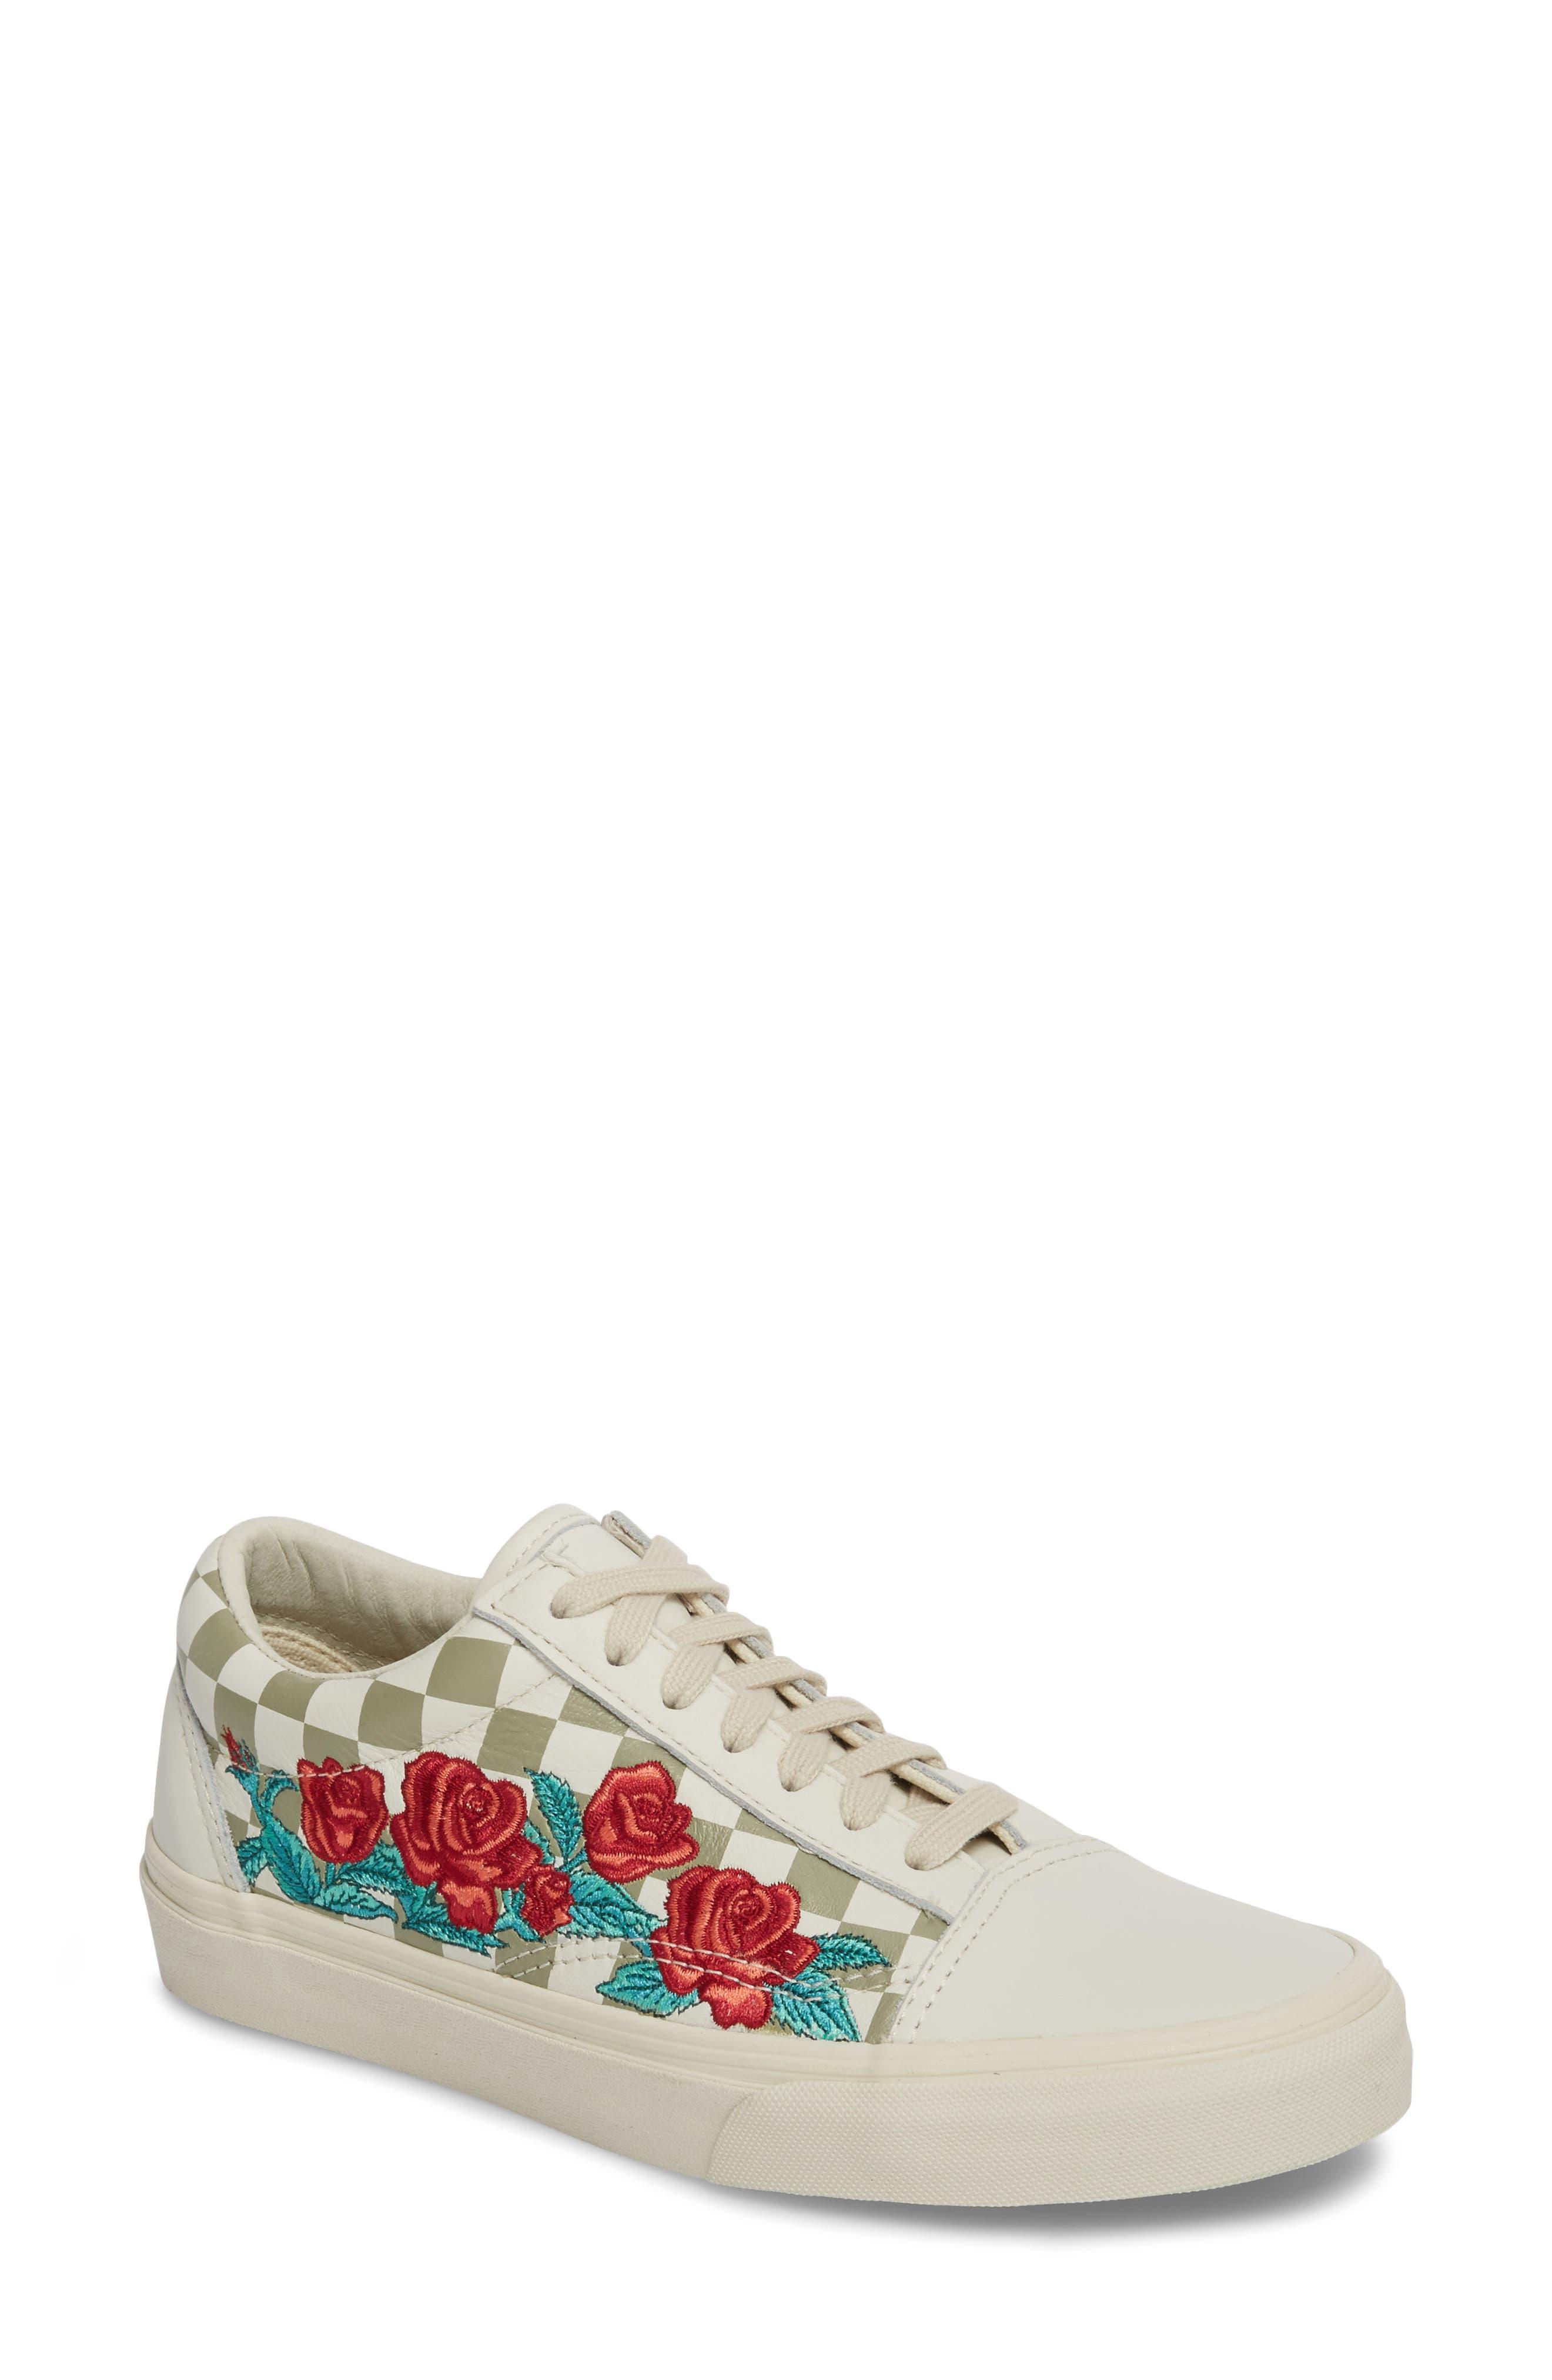 Old Skool 36 DX Sneaker,                             Main thumbnail 1, color,                             100